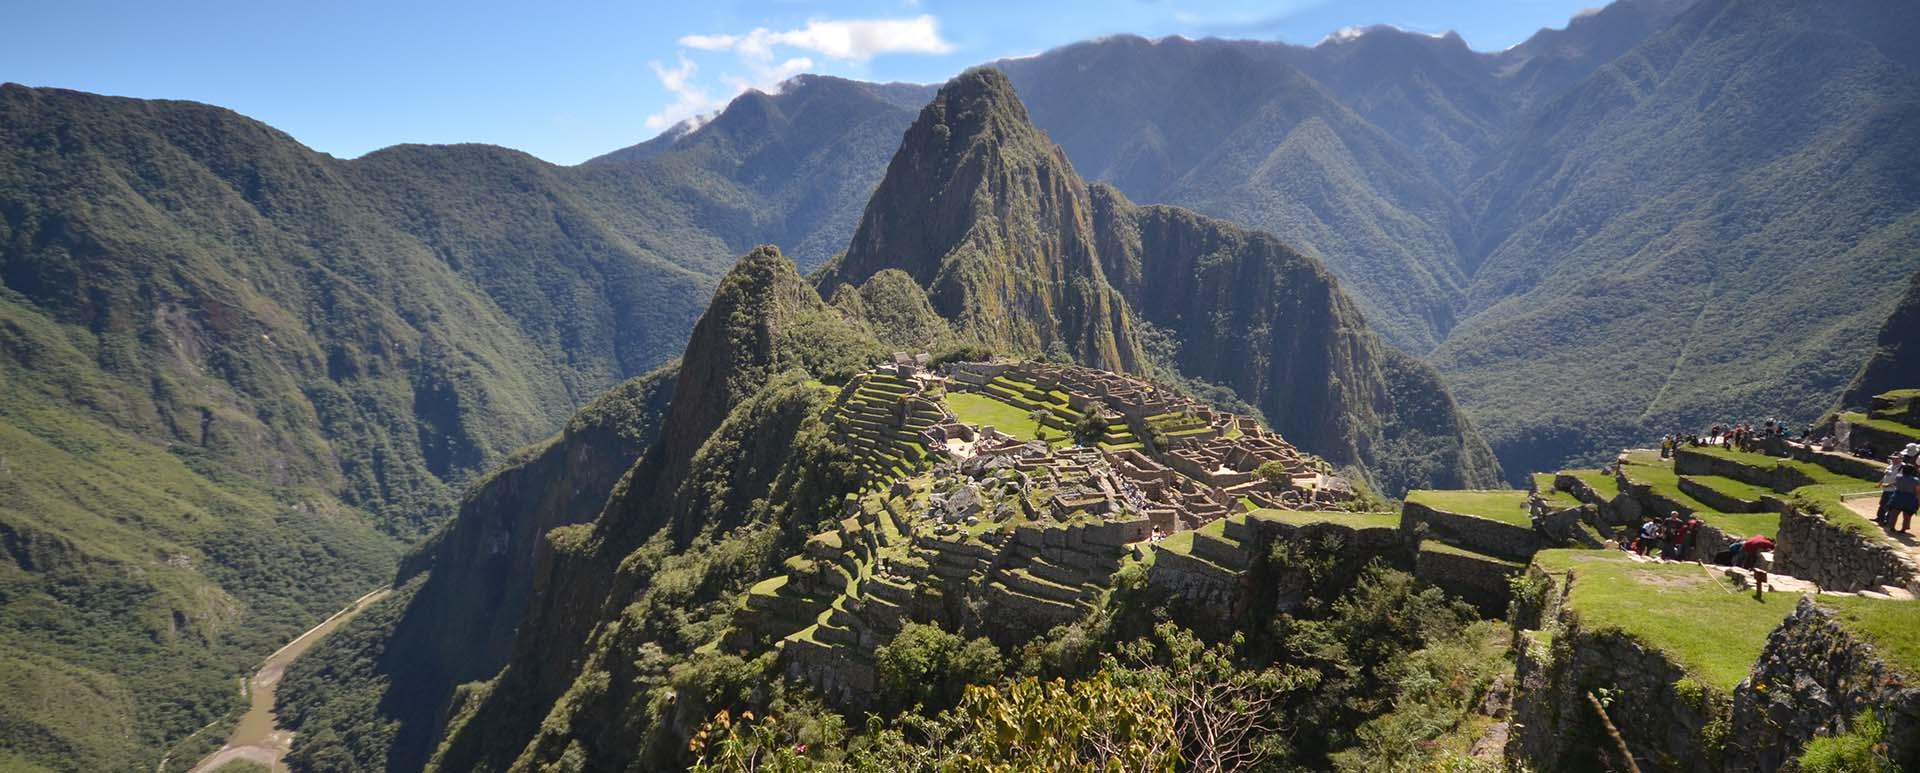 Galapagos and Machu Picchu Tours